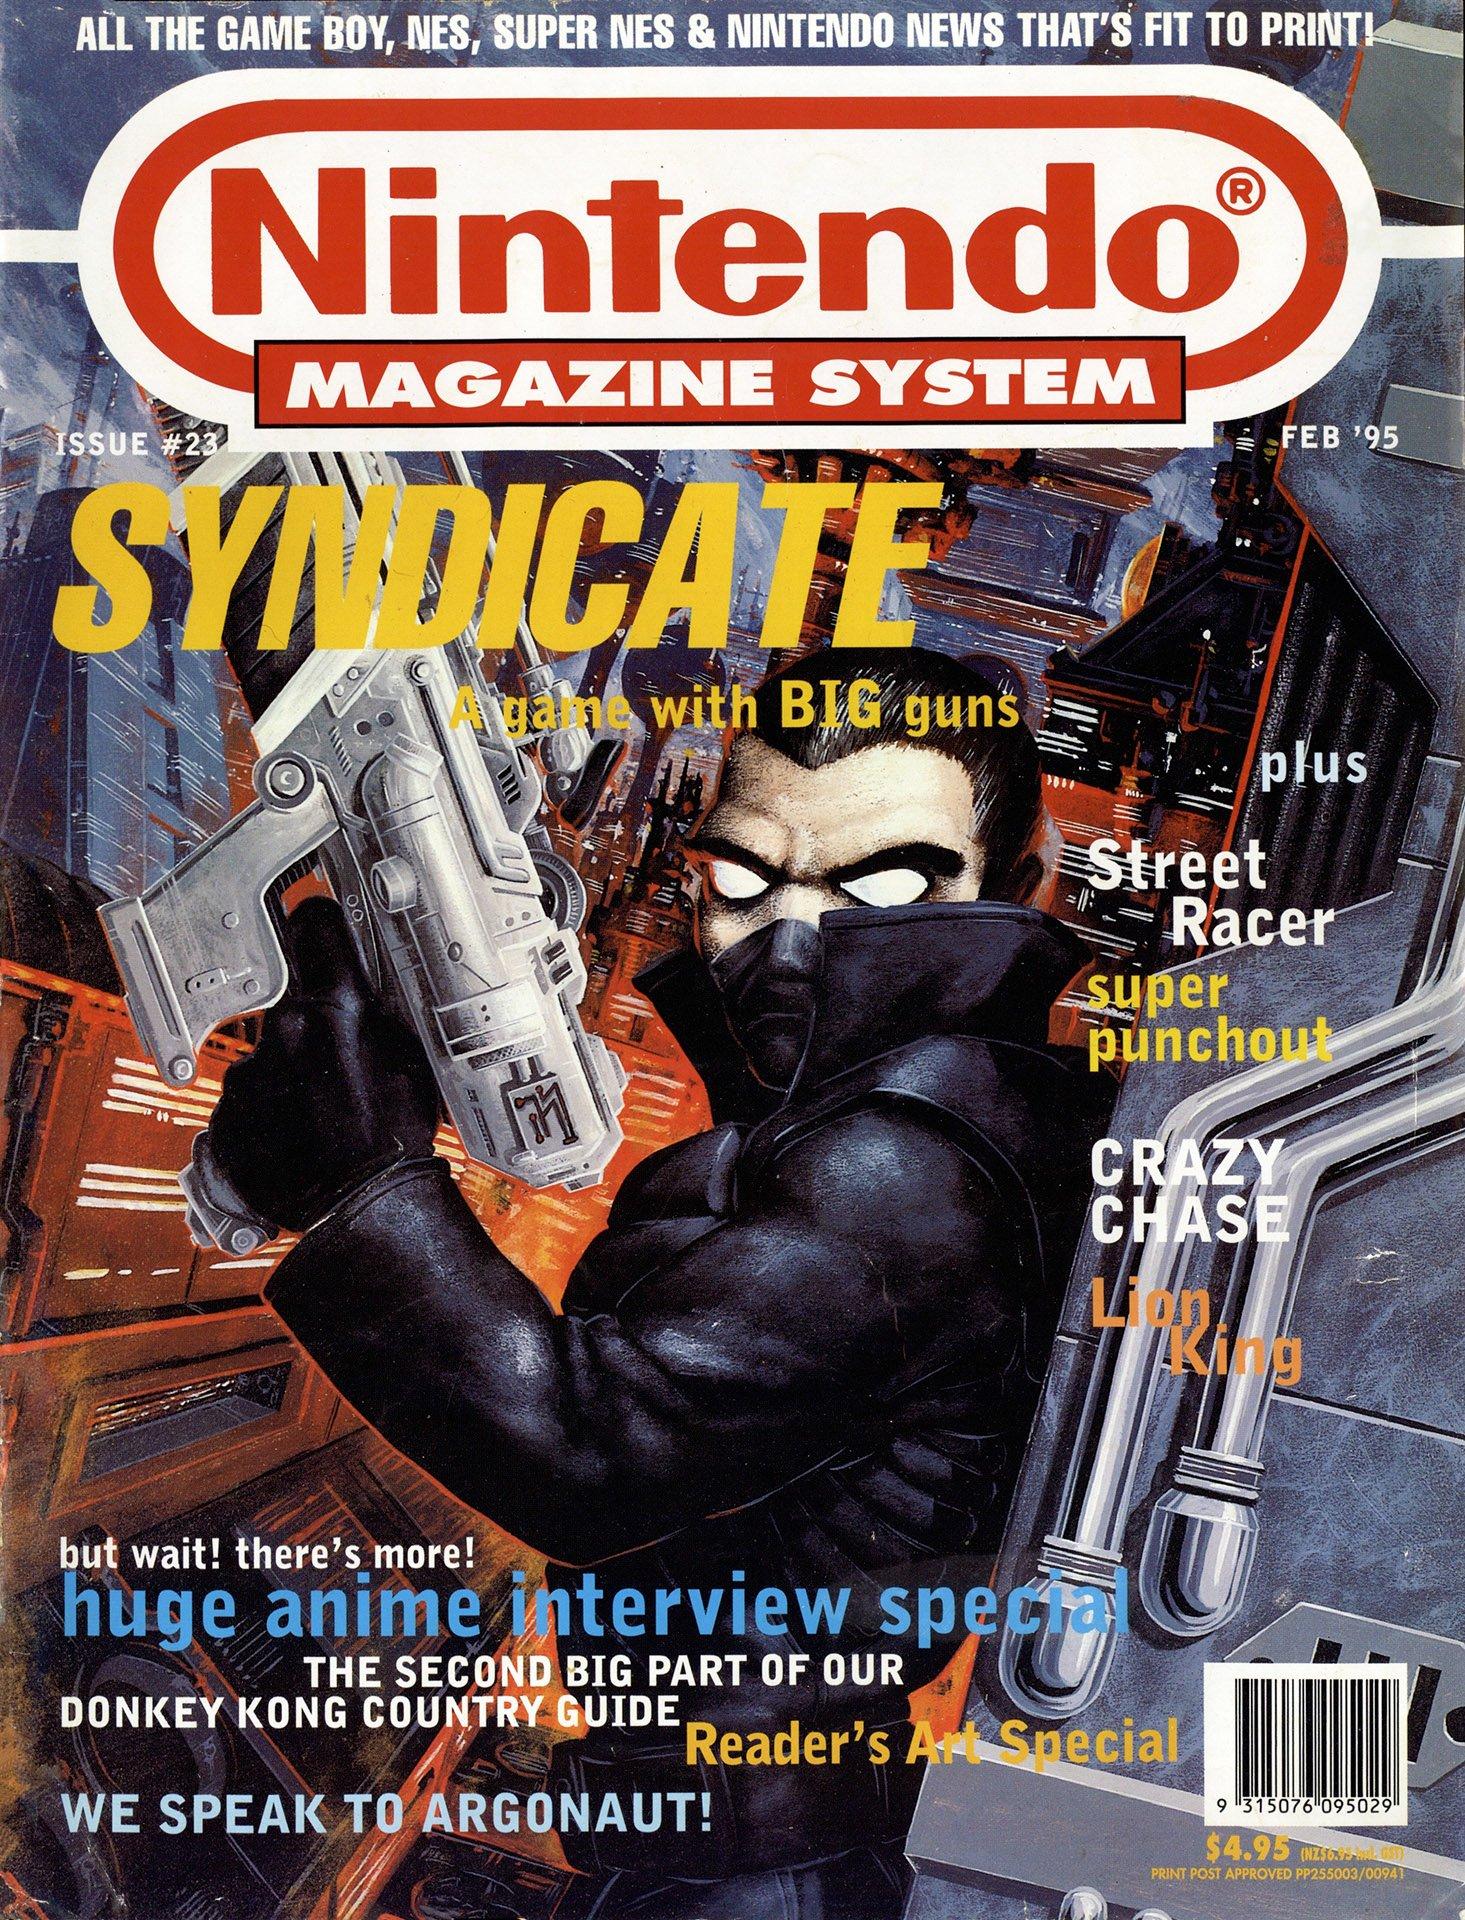 Nintendo Magazine System (AUS) 023 (February 1995)